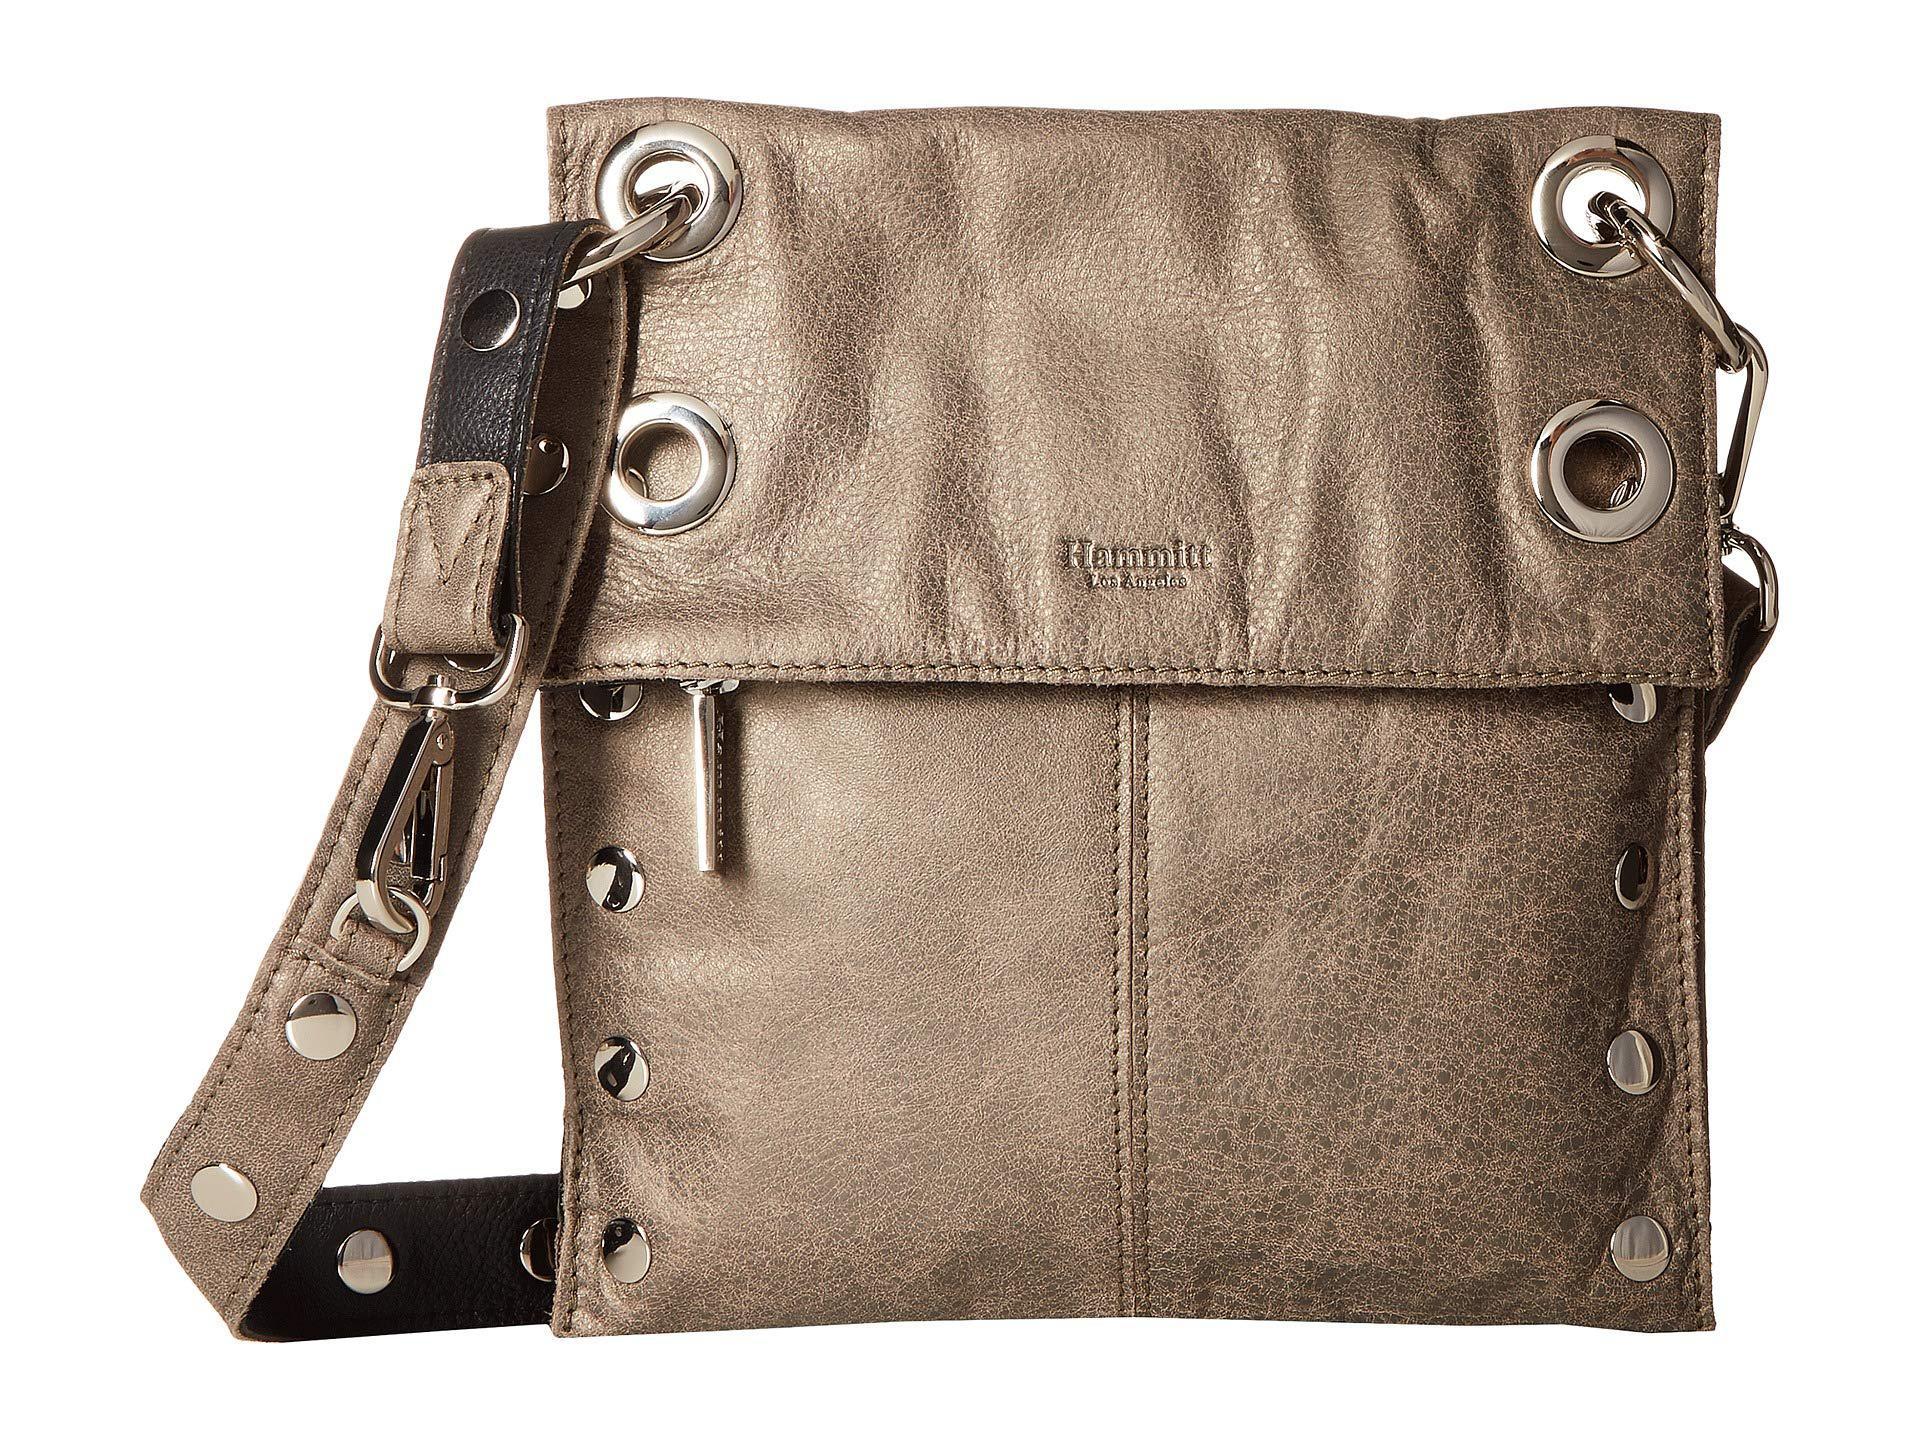 4cb8be307b Lyst - Hammitt Little Santa Monica Reversible Crossbody Bag